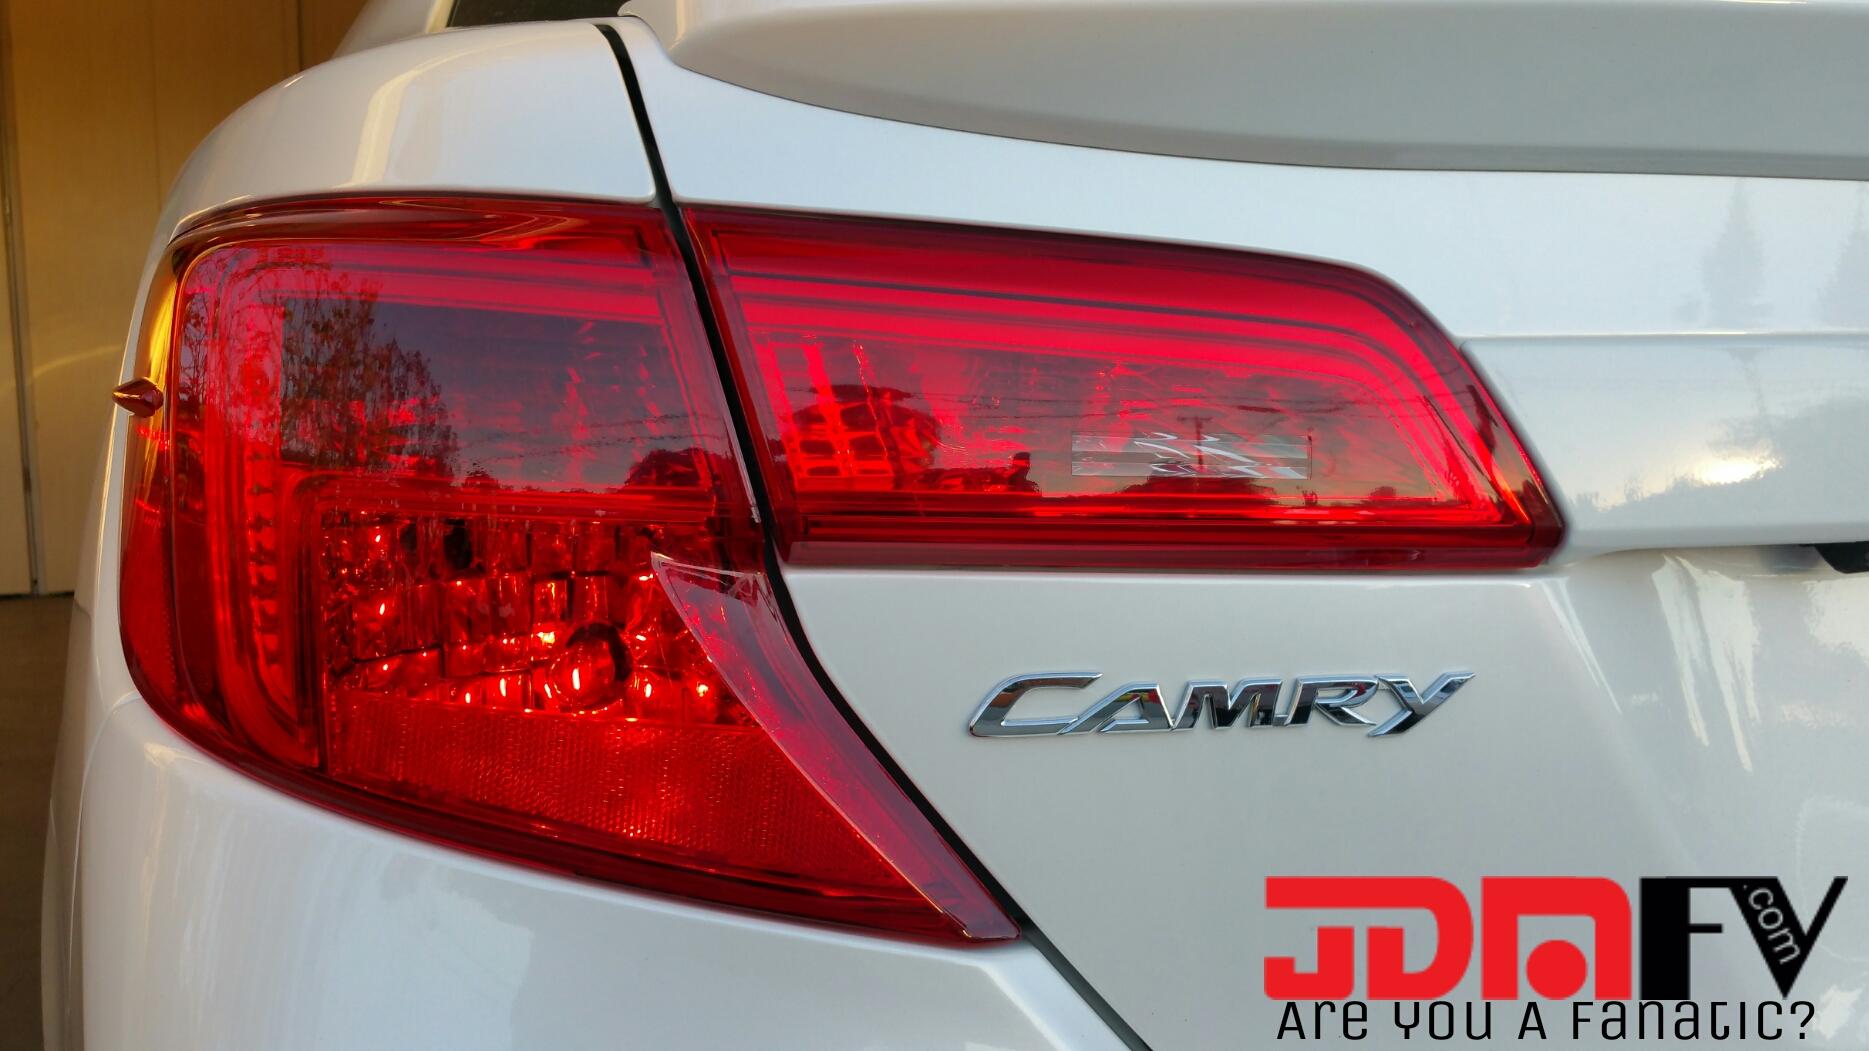 12 14 Toyota Camry Precut Redout Tail Light Overlays Tint